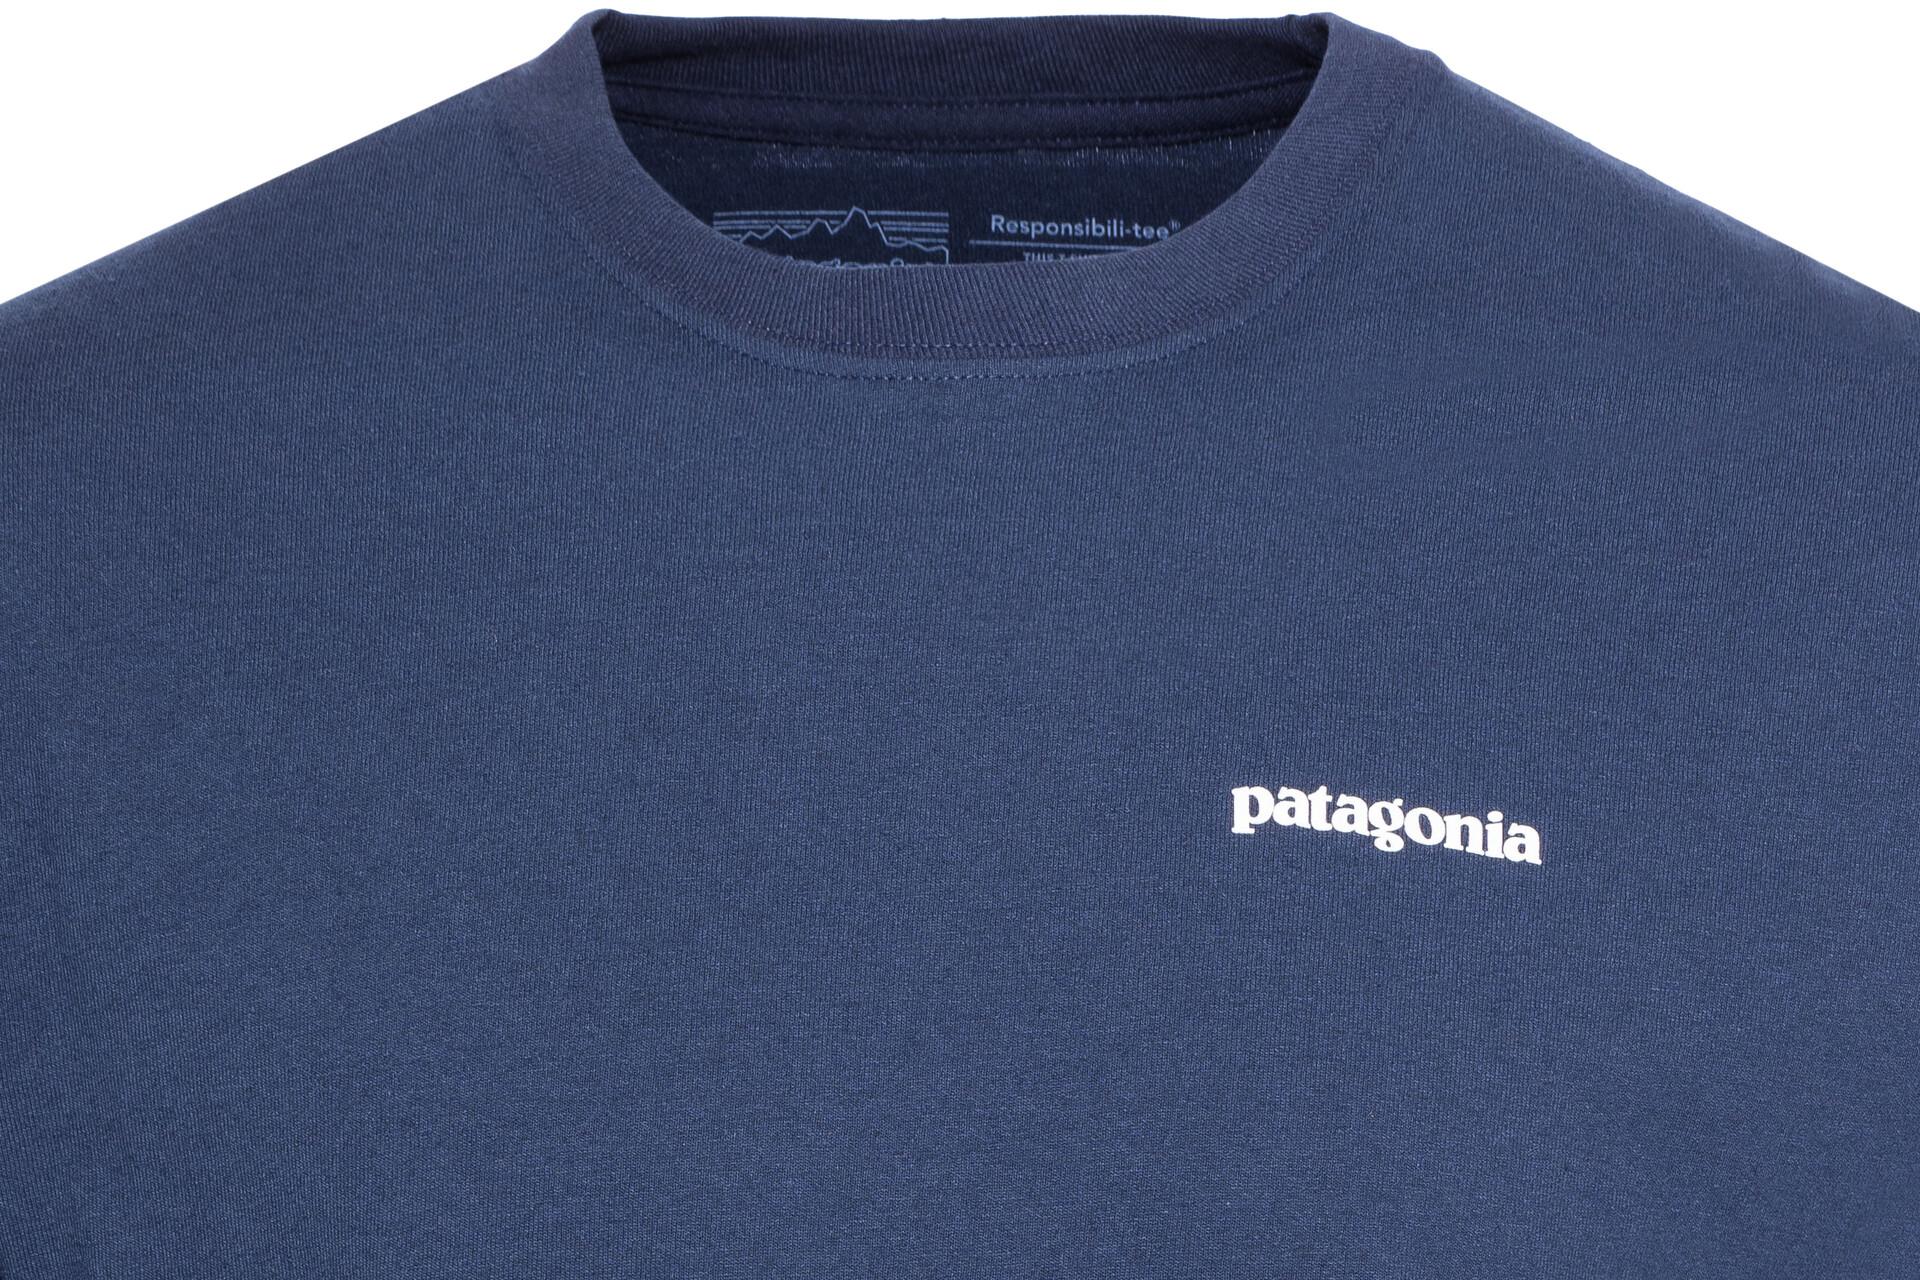 Patagonia ls p-6 Logo responsibili Thé Chemise Manches Longues Bleu